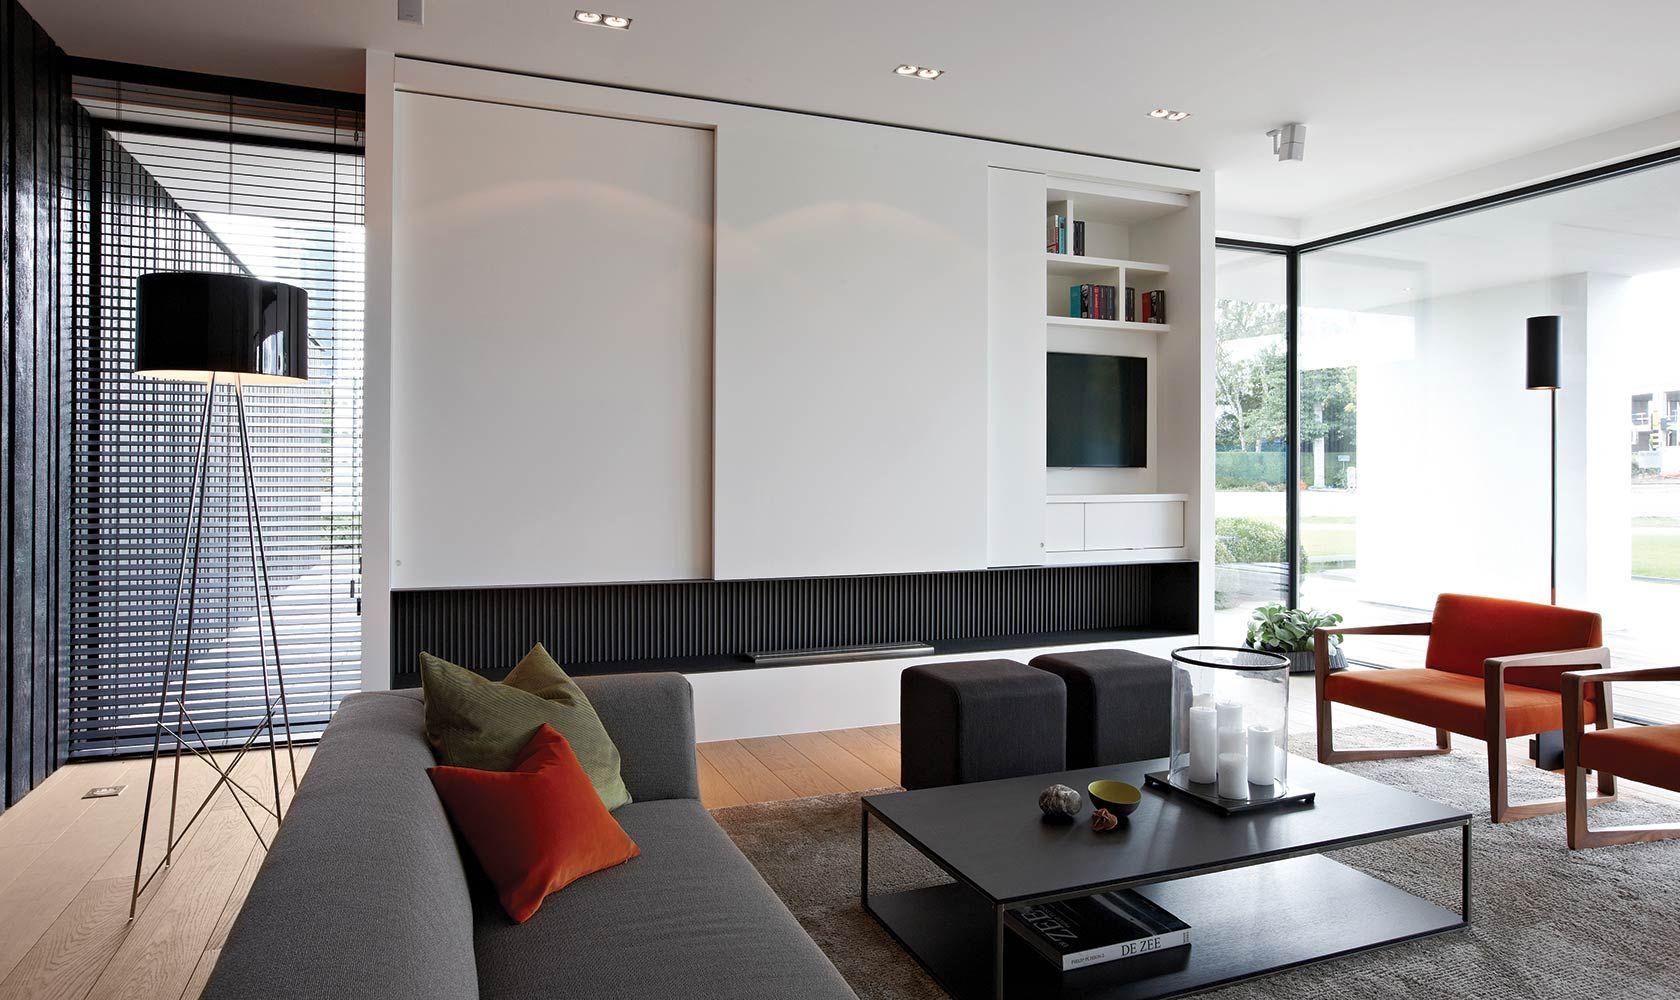 moderne gezellige woonkamer - Google zoeken - Woonkamer ...